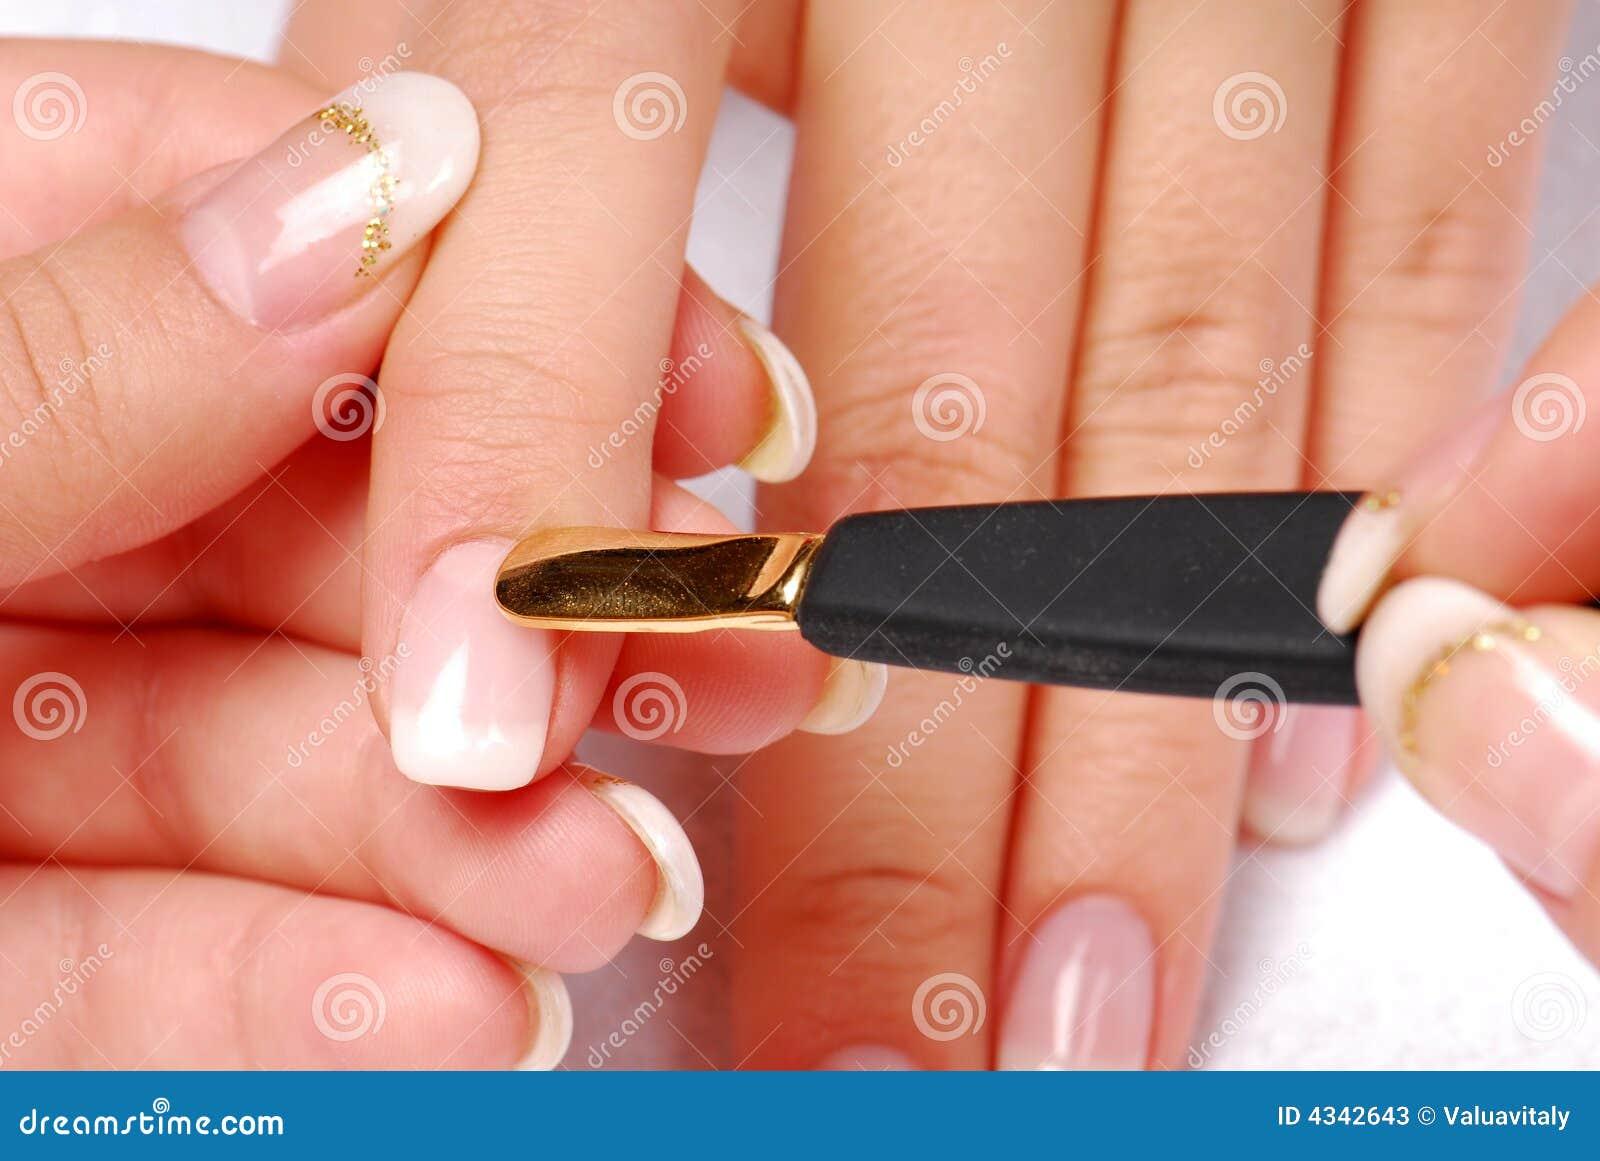 Omoplata do Manicure